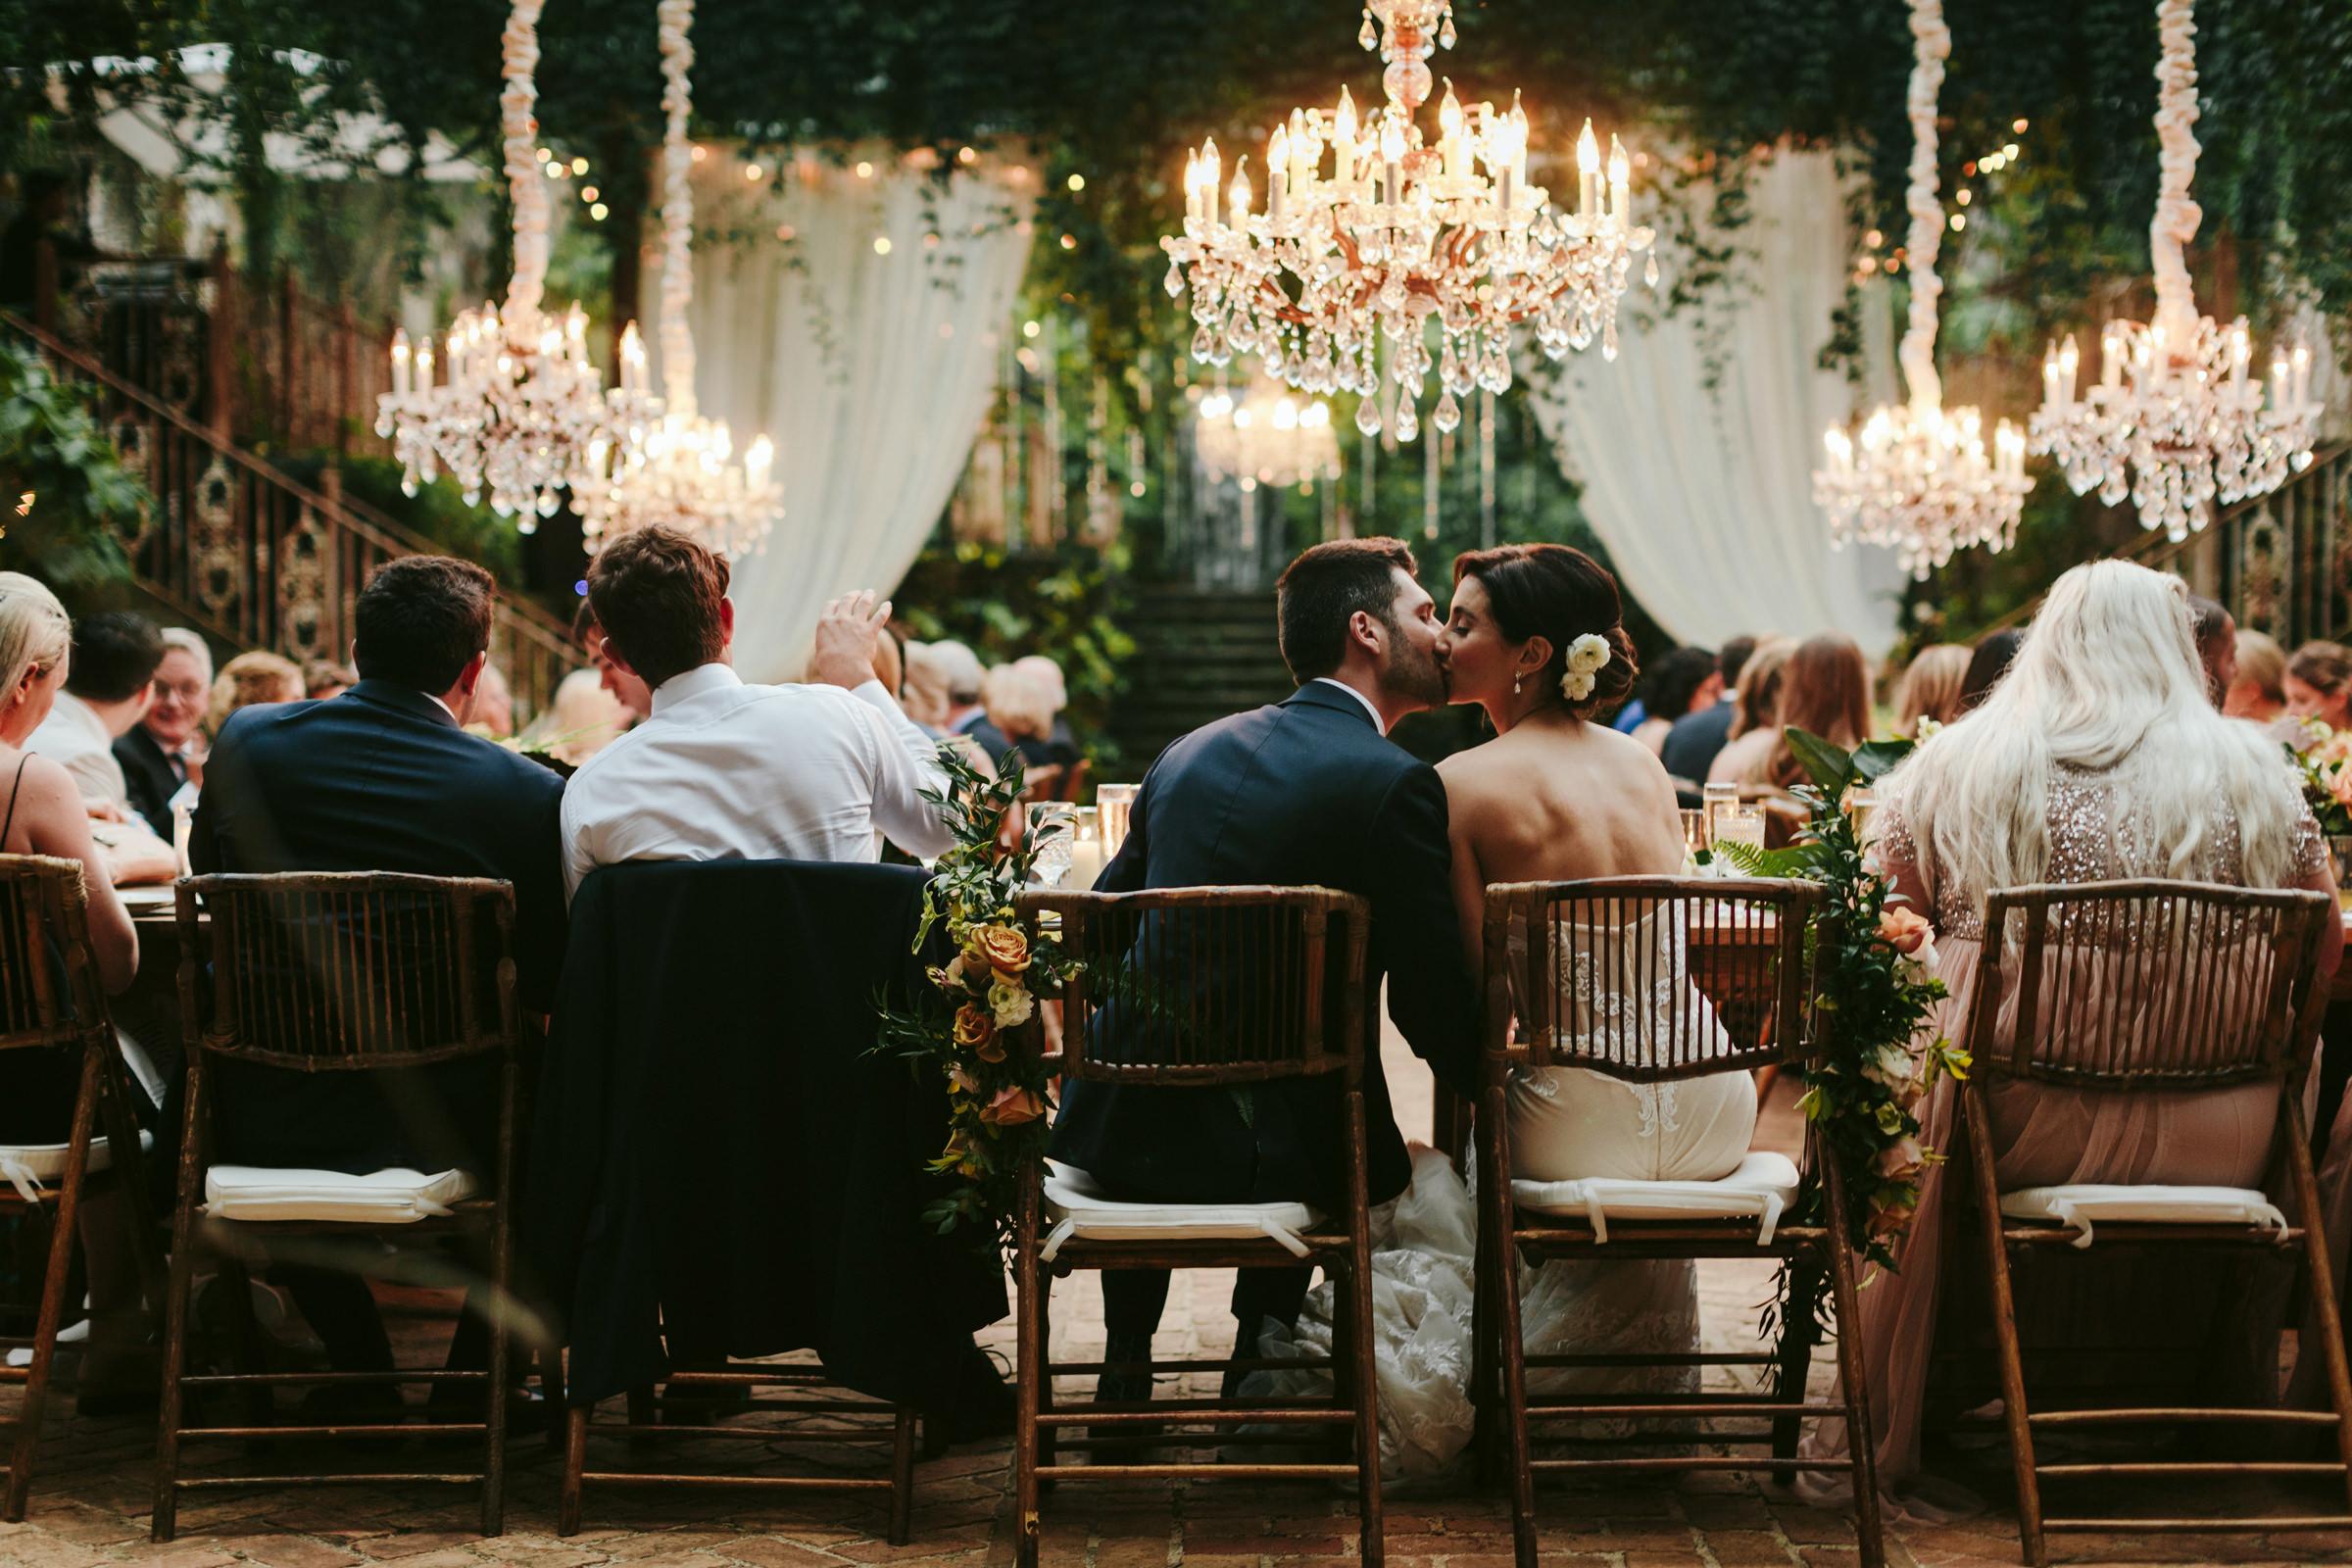 Couple kisses at Haiku Mill wedding reception - photo by Melia Lucida Photography